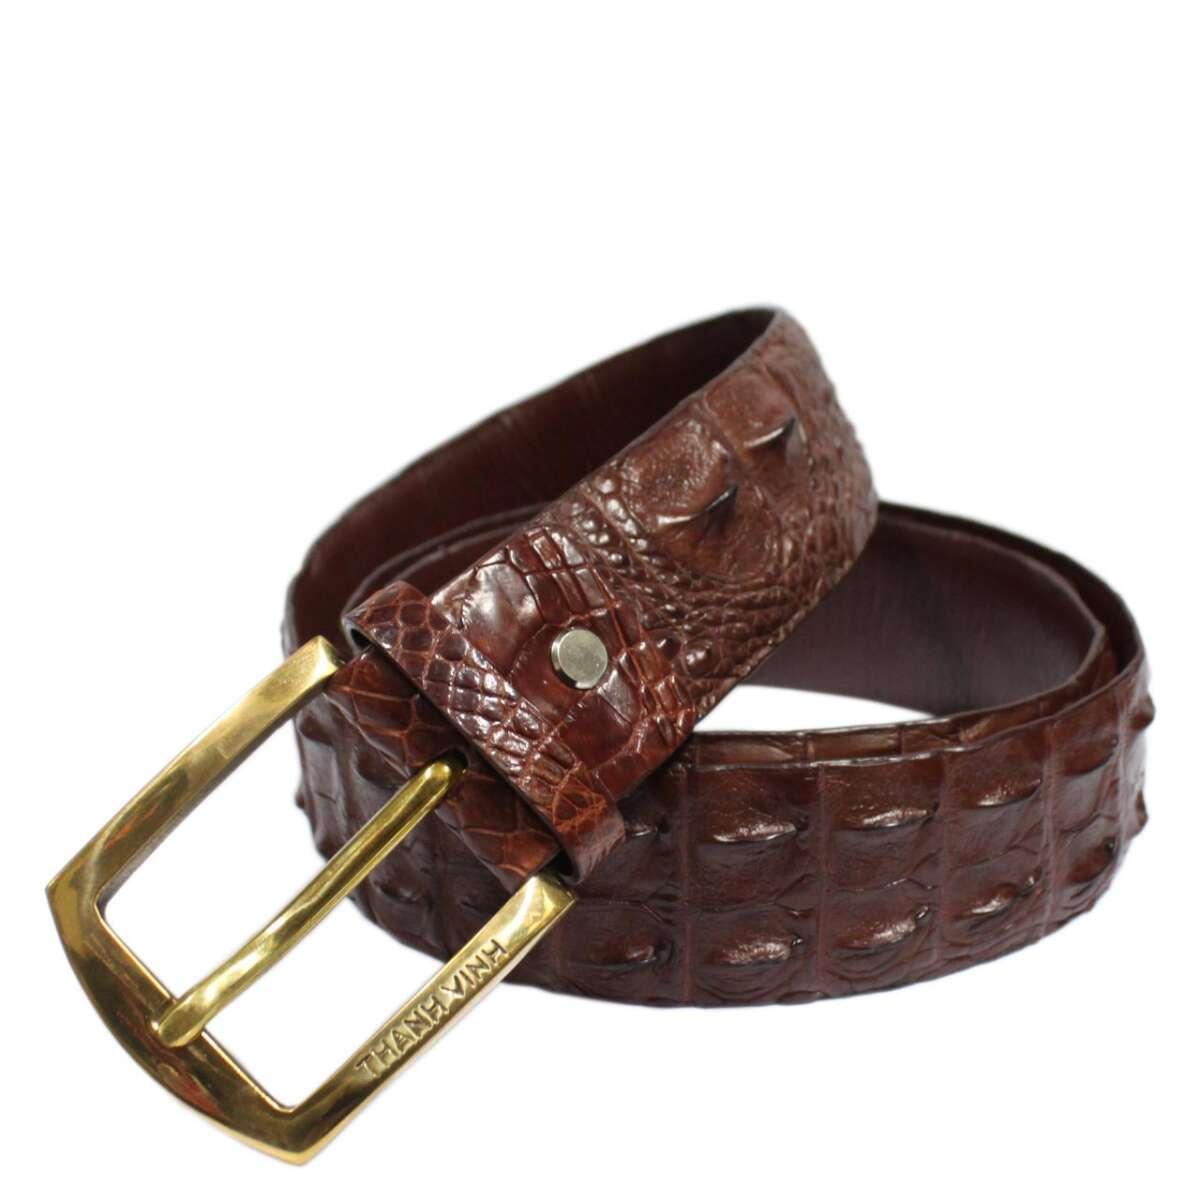 Crocodile leather belt S604a